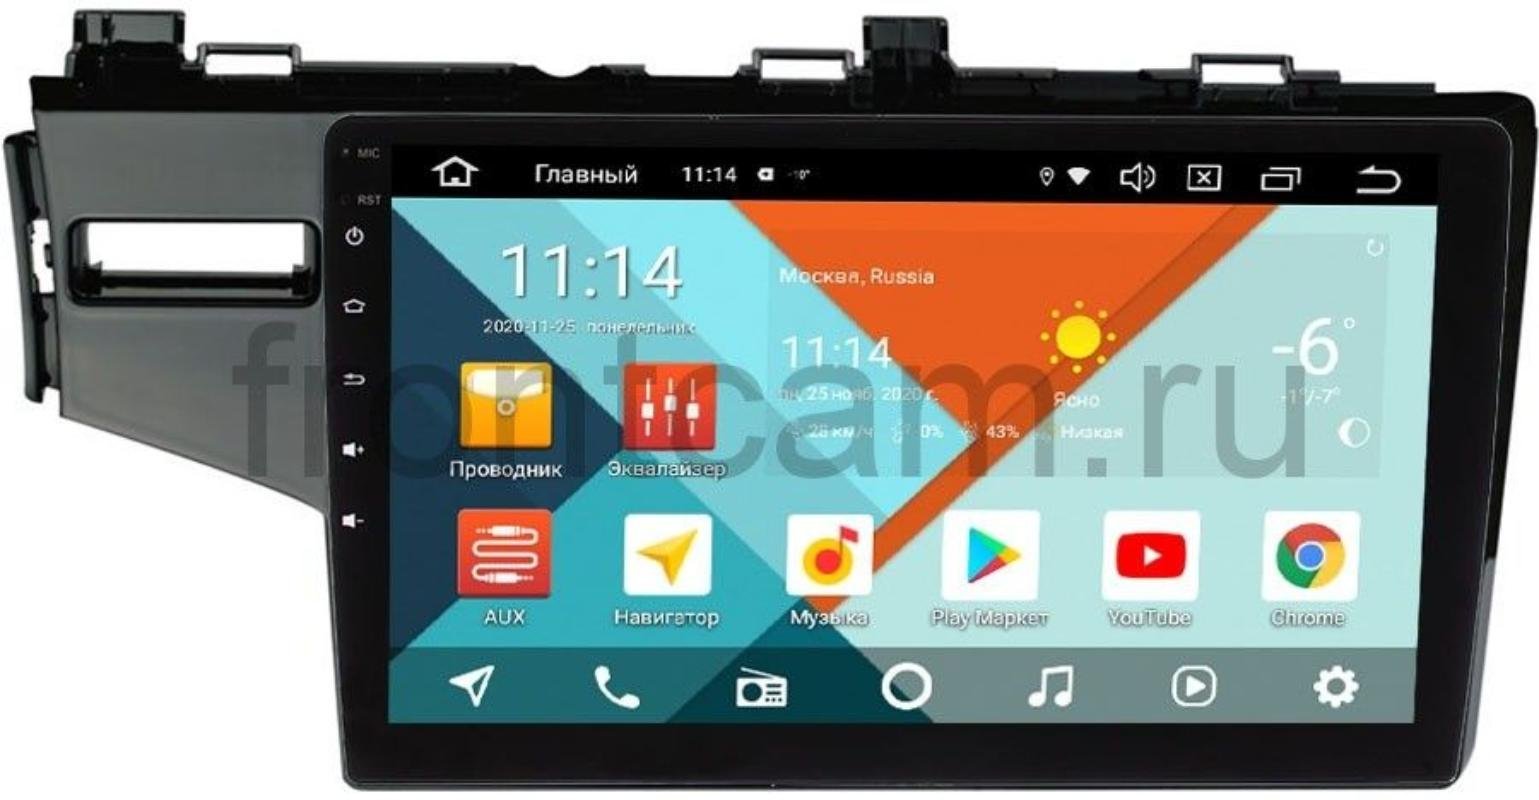 Штатная магнитола Honda Fit III, Jazz III 2015-2017 Wide Media KS10-468QR-3/32 DSP CarPlay 4G-SIM на Android 10 (+ Камера заднего вида в подарок!)